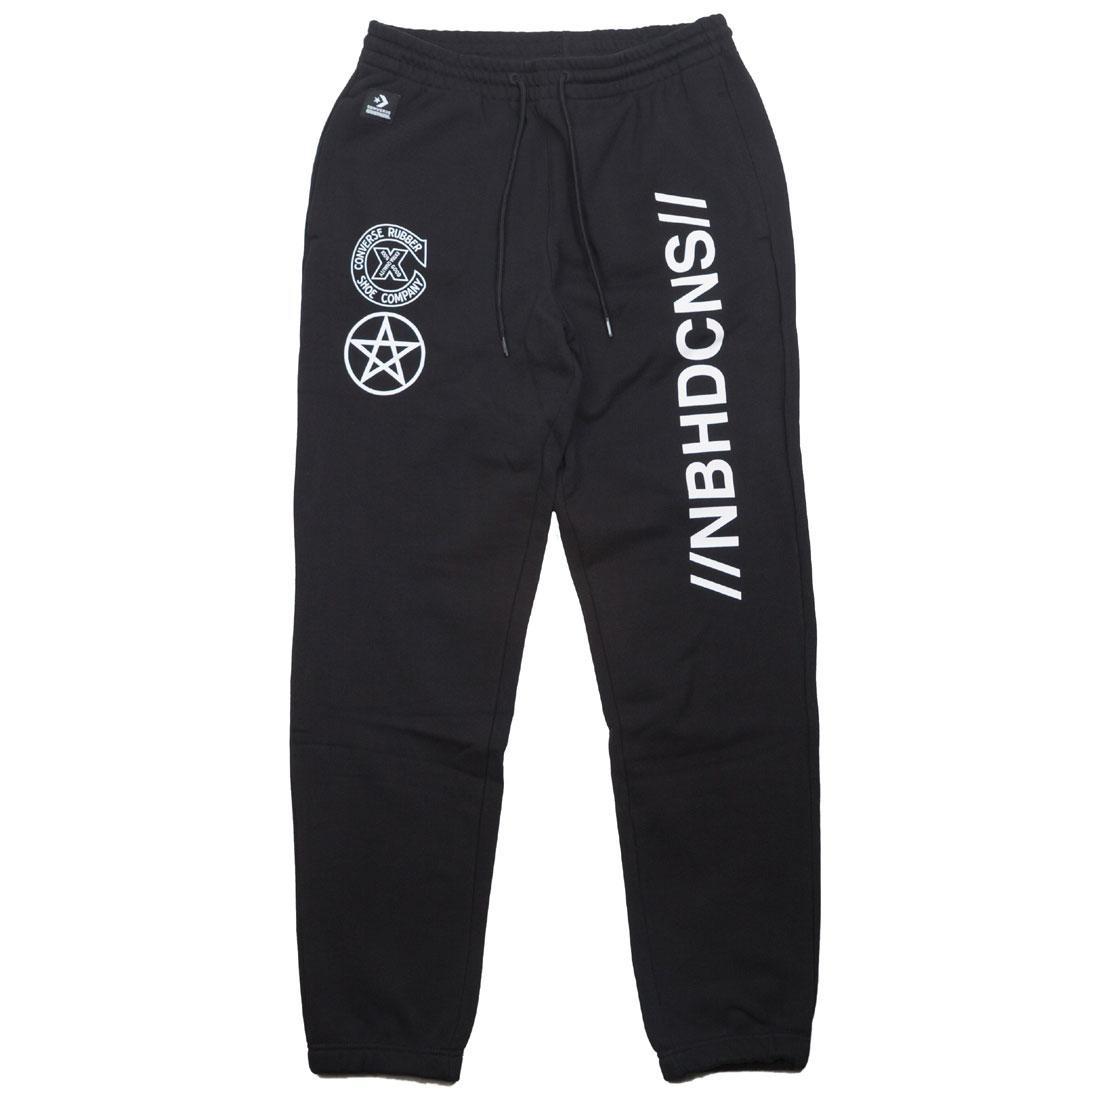 Converse x Neighborhood Men Sweatpants (black)